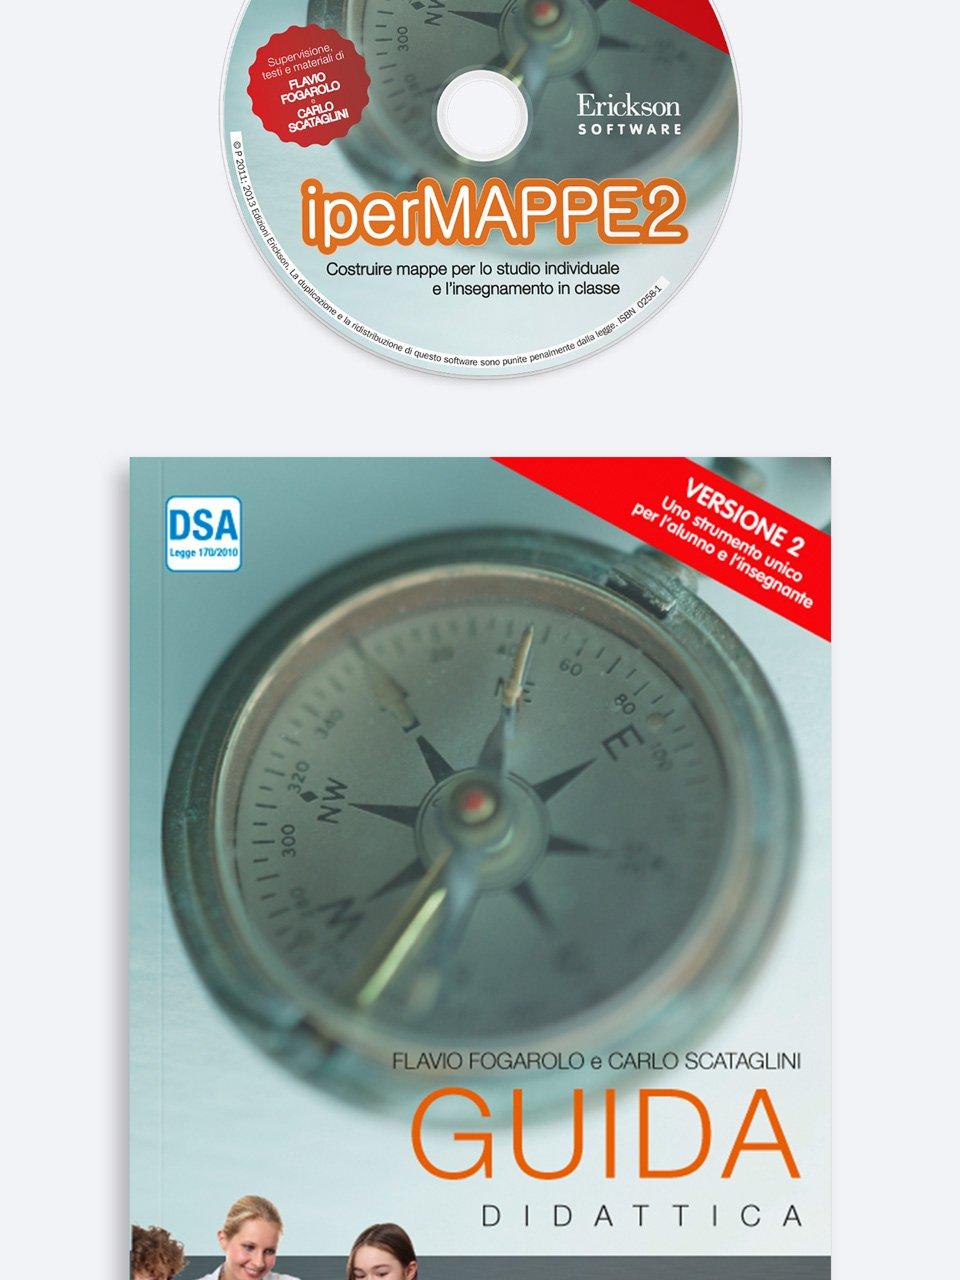 IperMAPPE 2 - Ipermappe 2 - Erickson